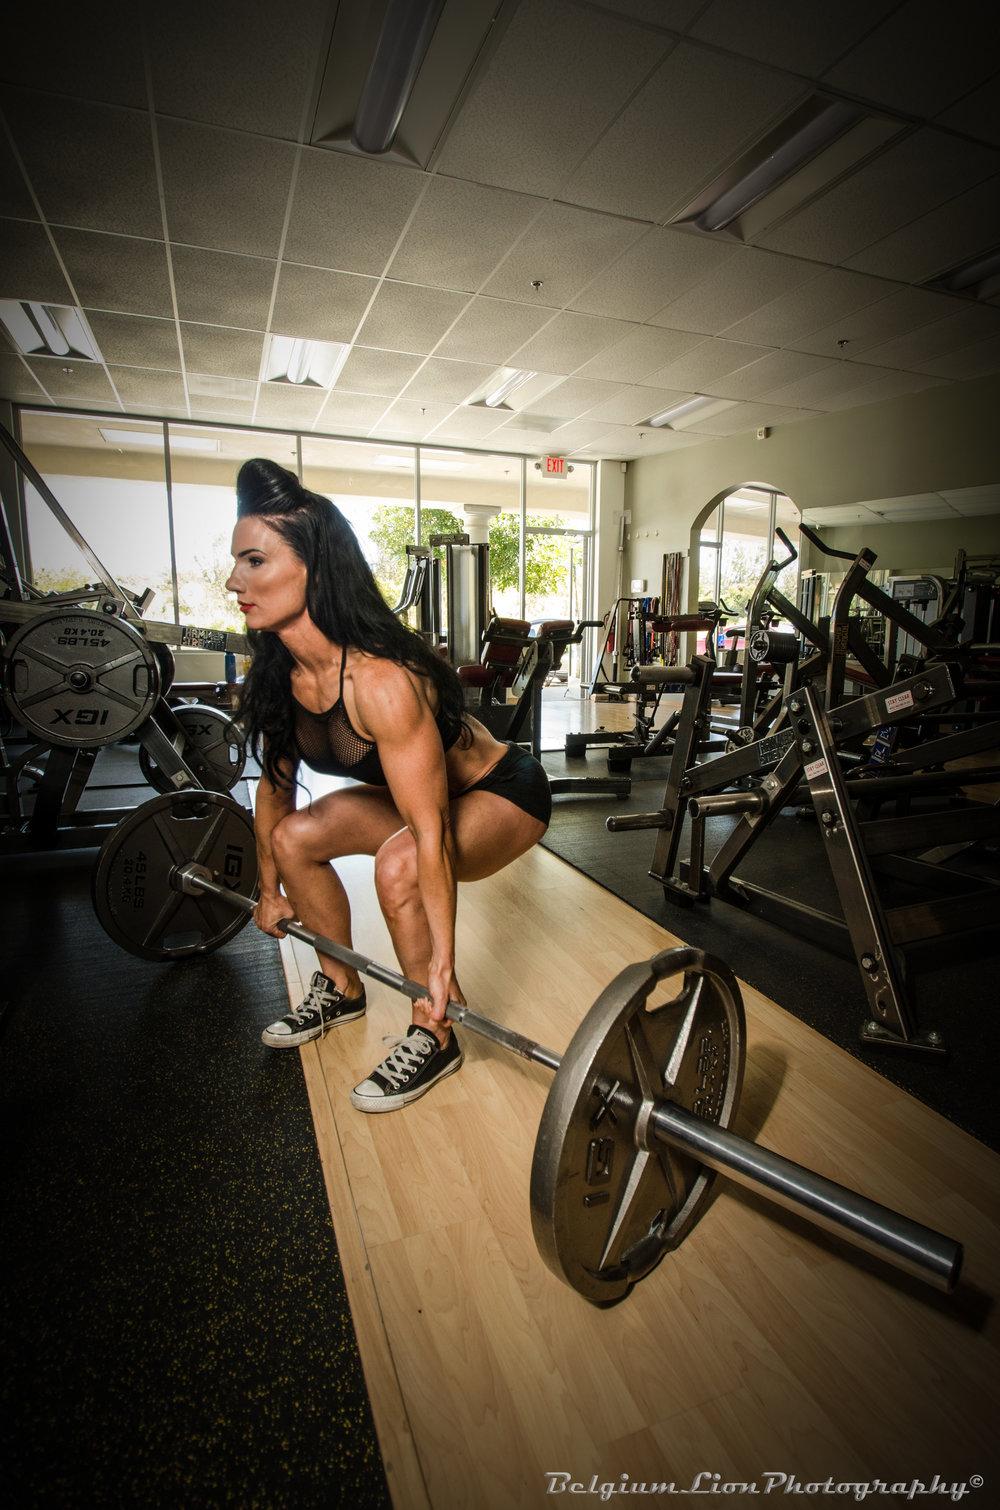 Personal training carlsbad